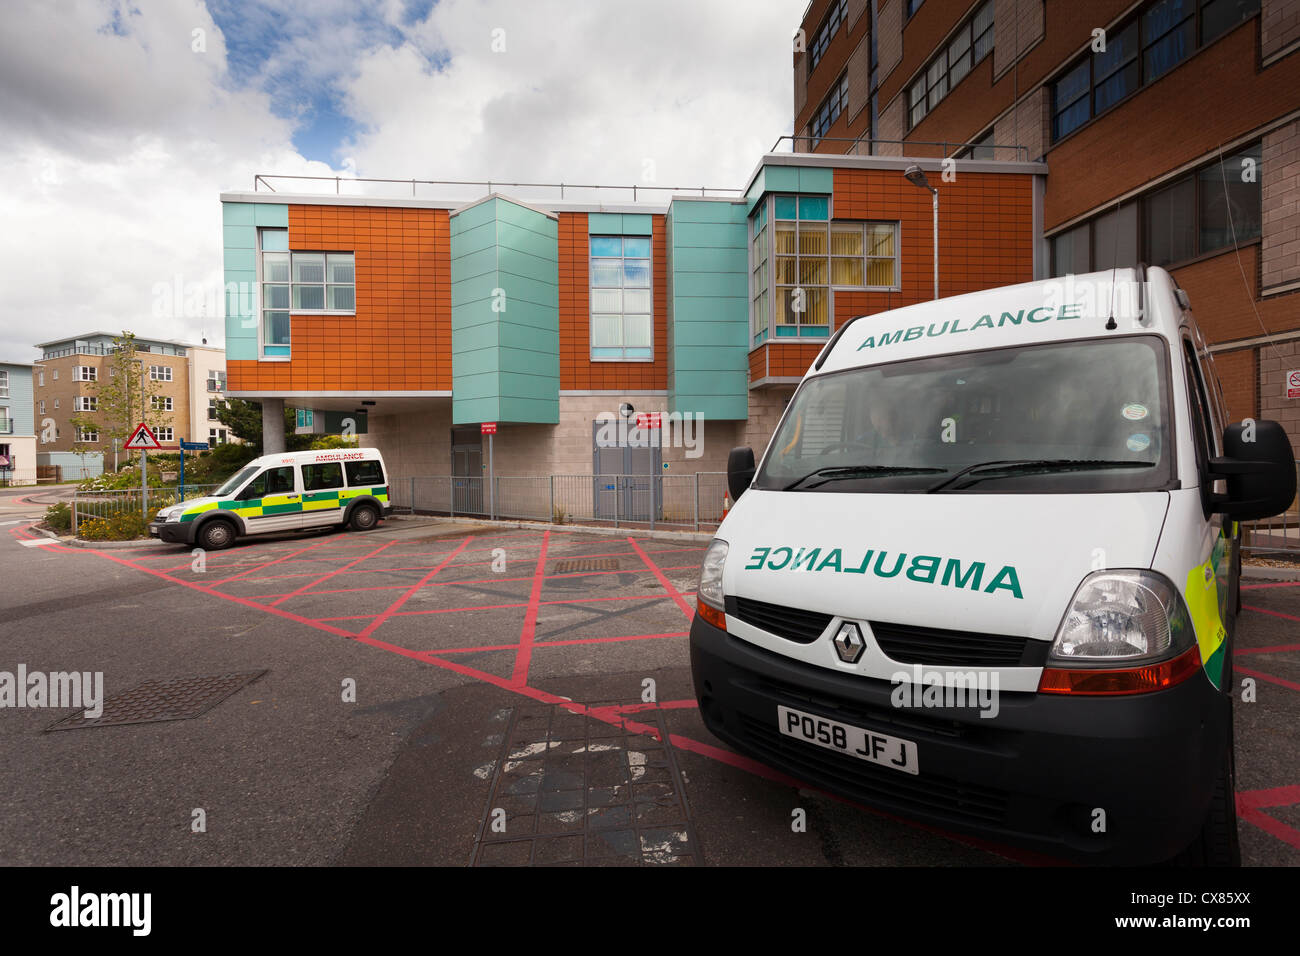 Ambulance parked outside the Haematology department of Southampton General Hospital - Stock Image